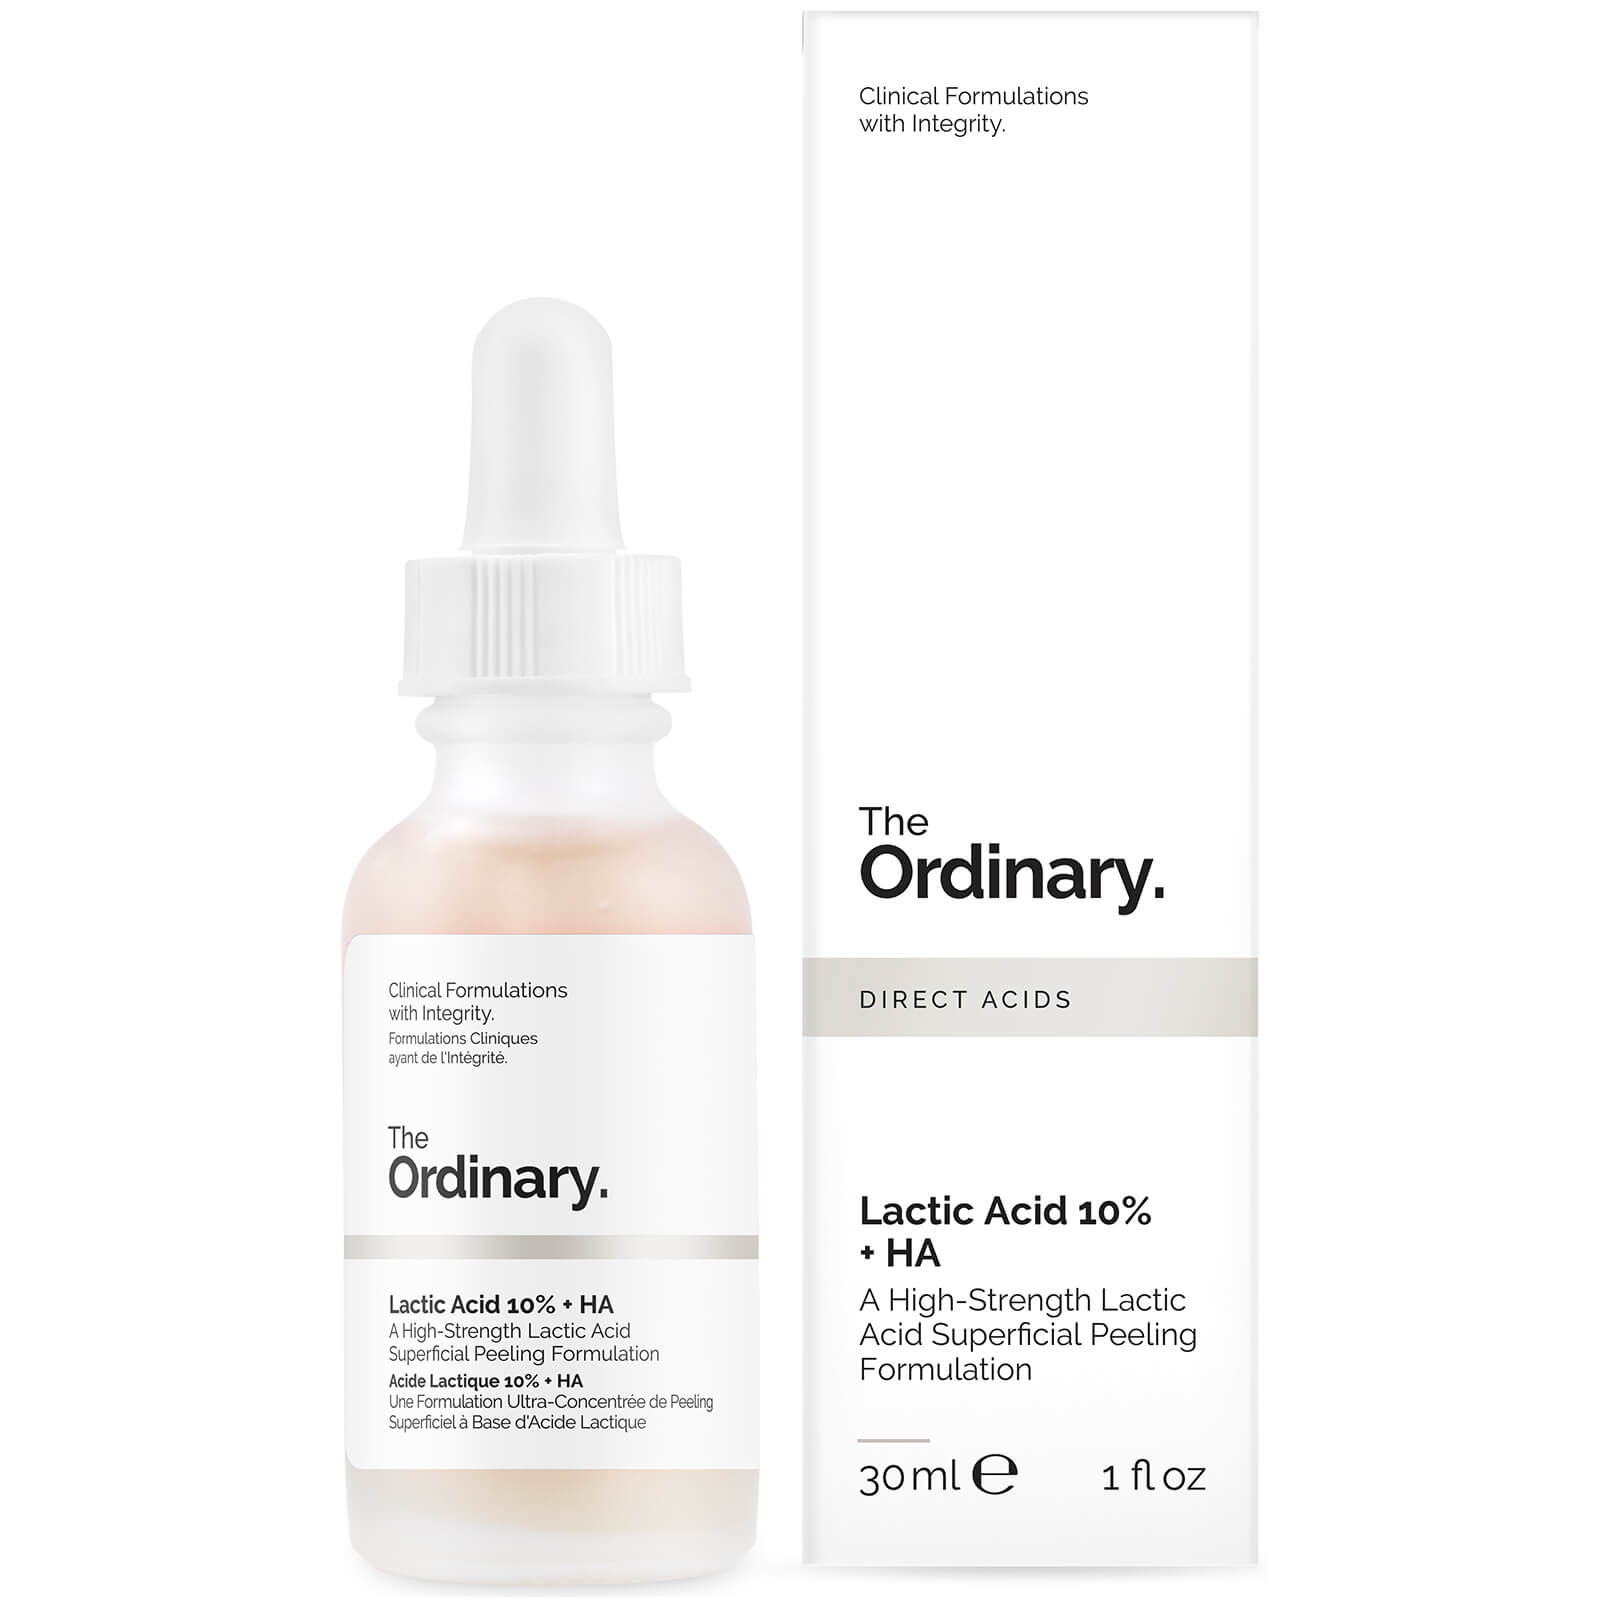 The Ordinary Lactic Acid 10% + HA 2% Superficial Peeling Formulation 30 ml